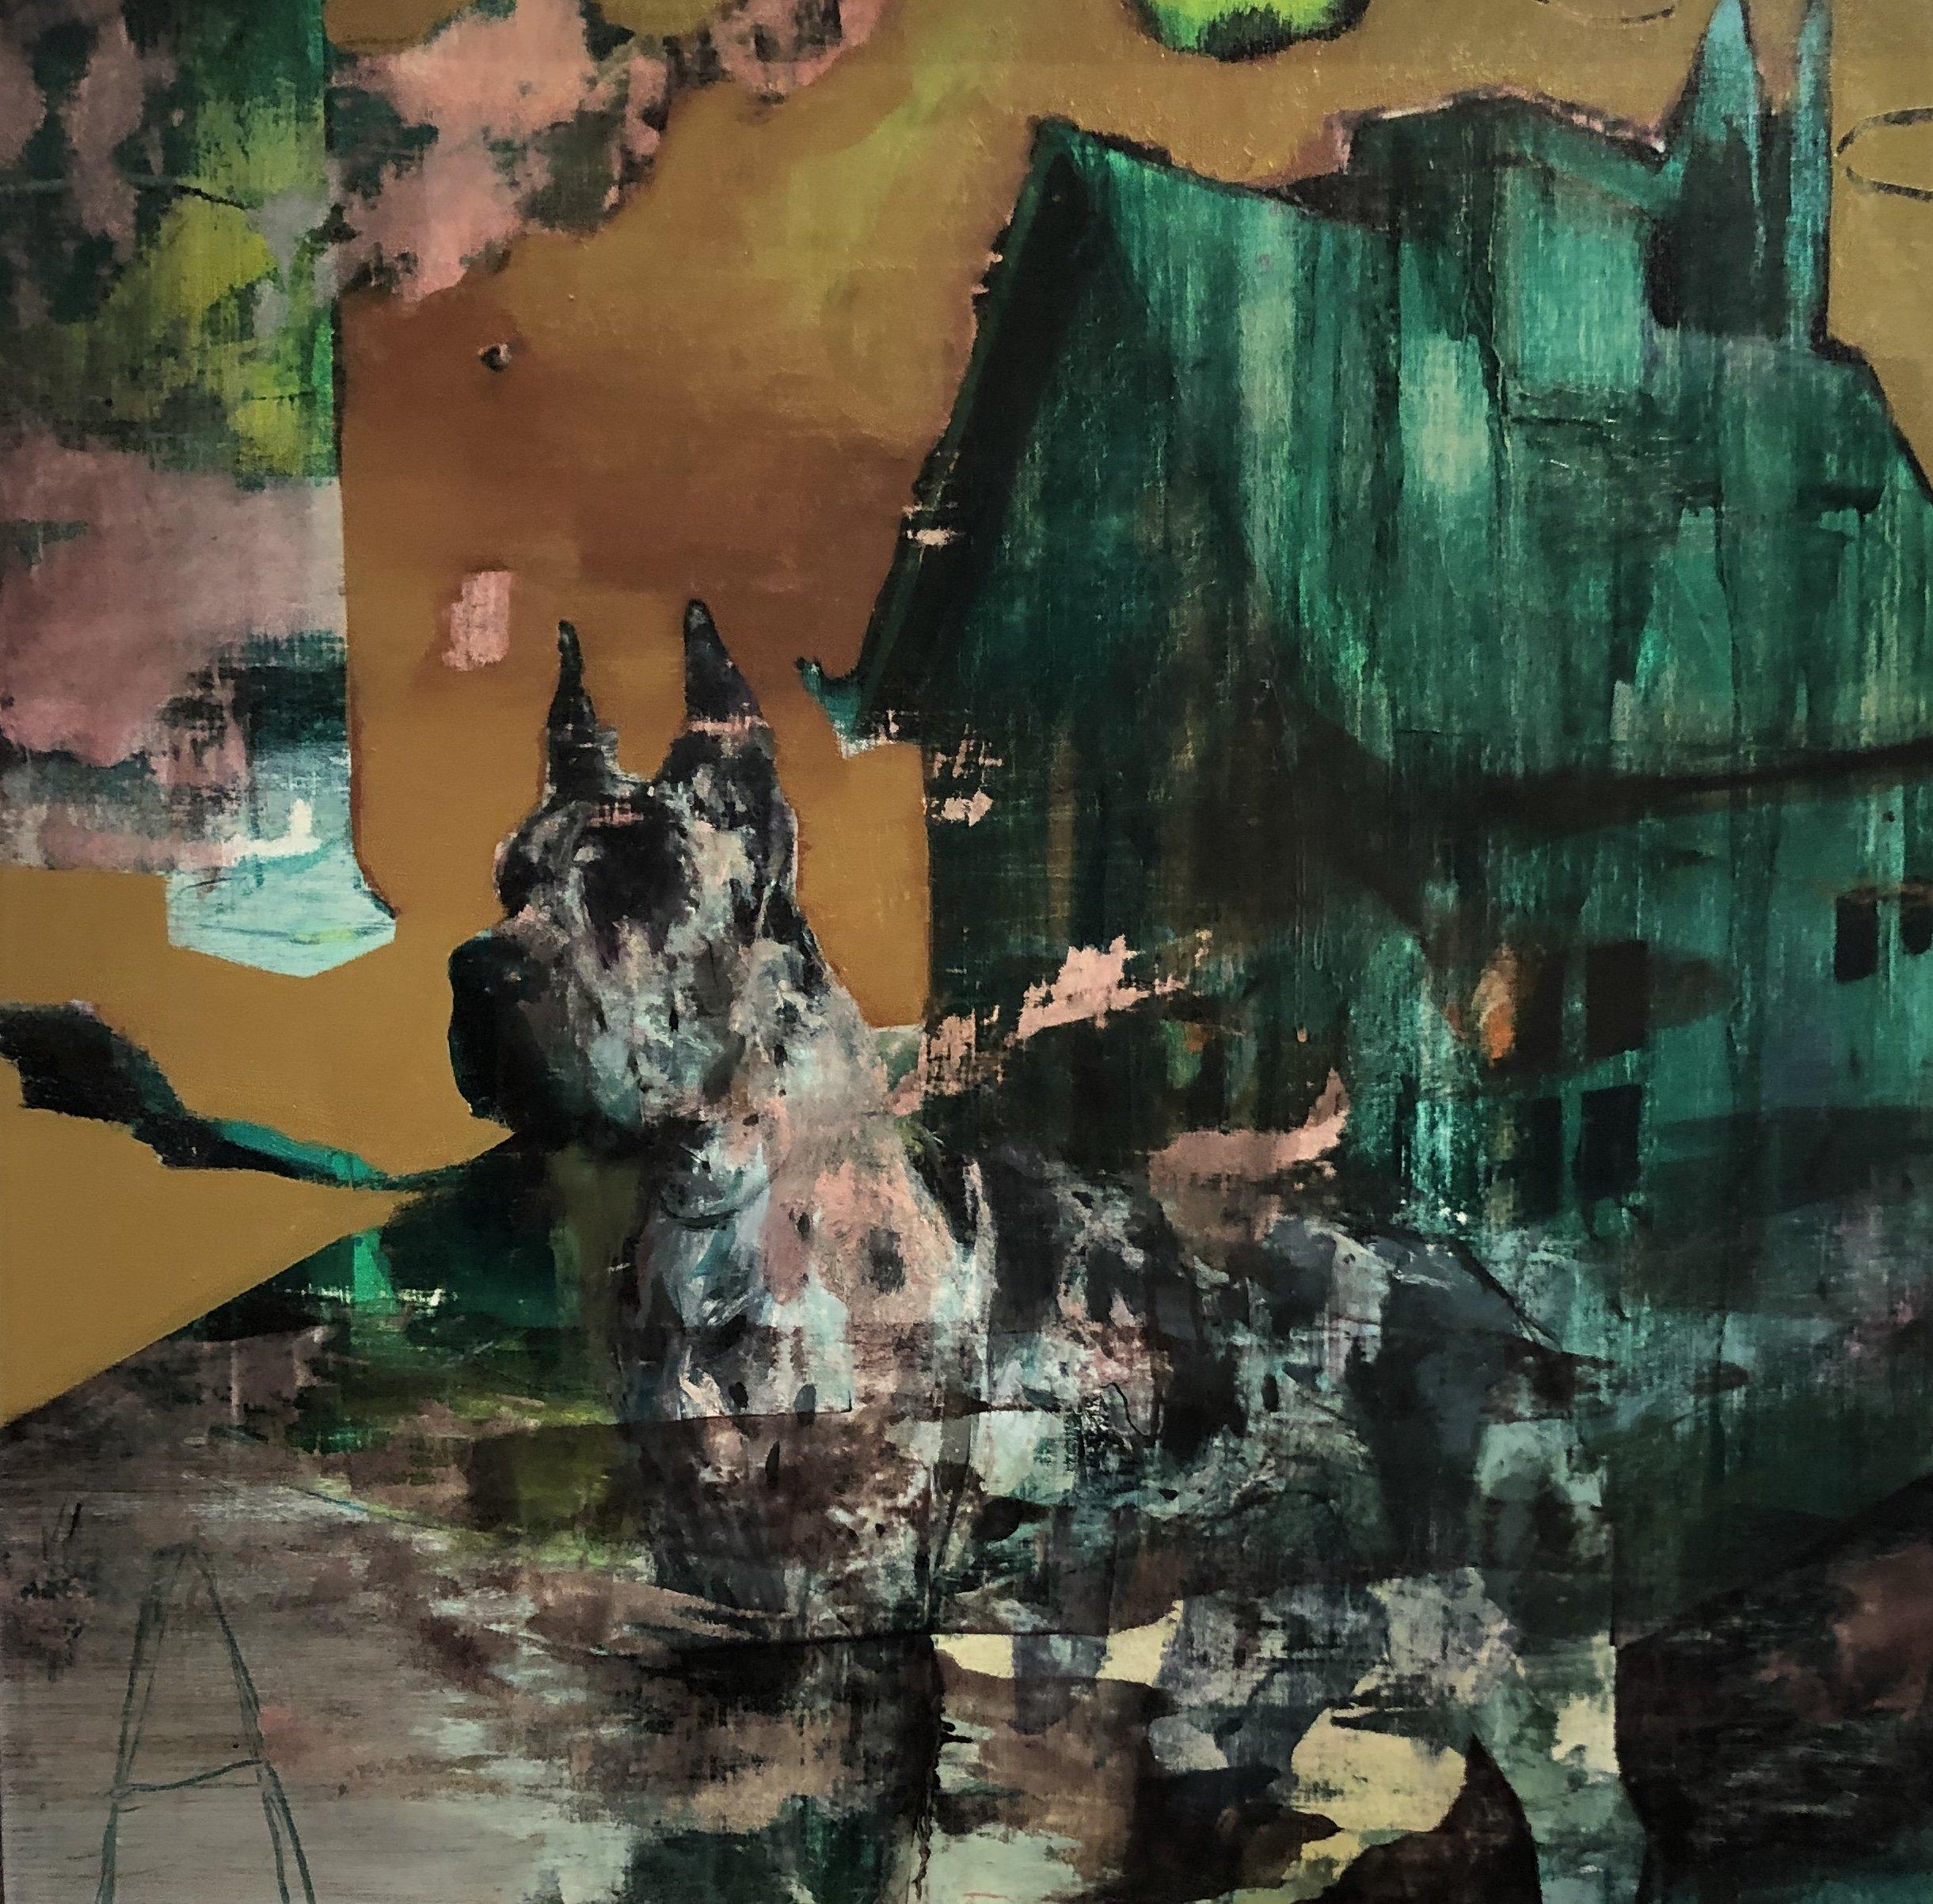 "Jose Luis Ceña Ruiz - The Green House - 2020 - Oil on Linen - 32"" x 32"""